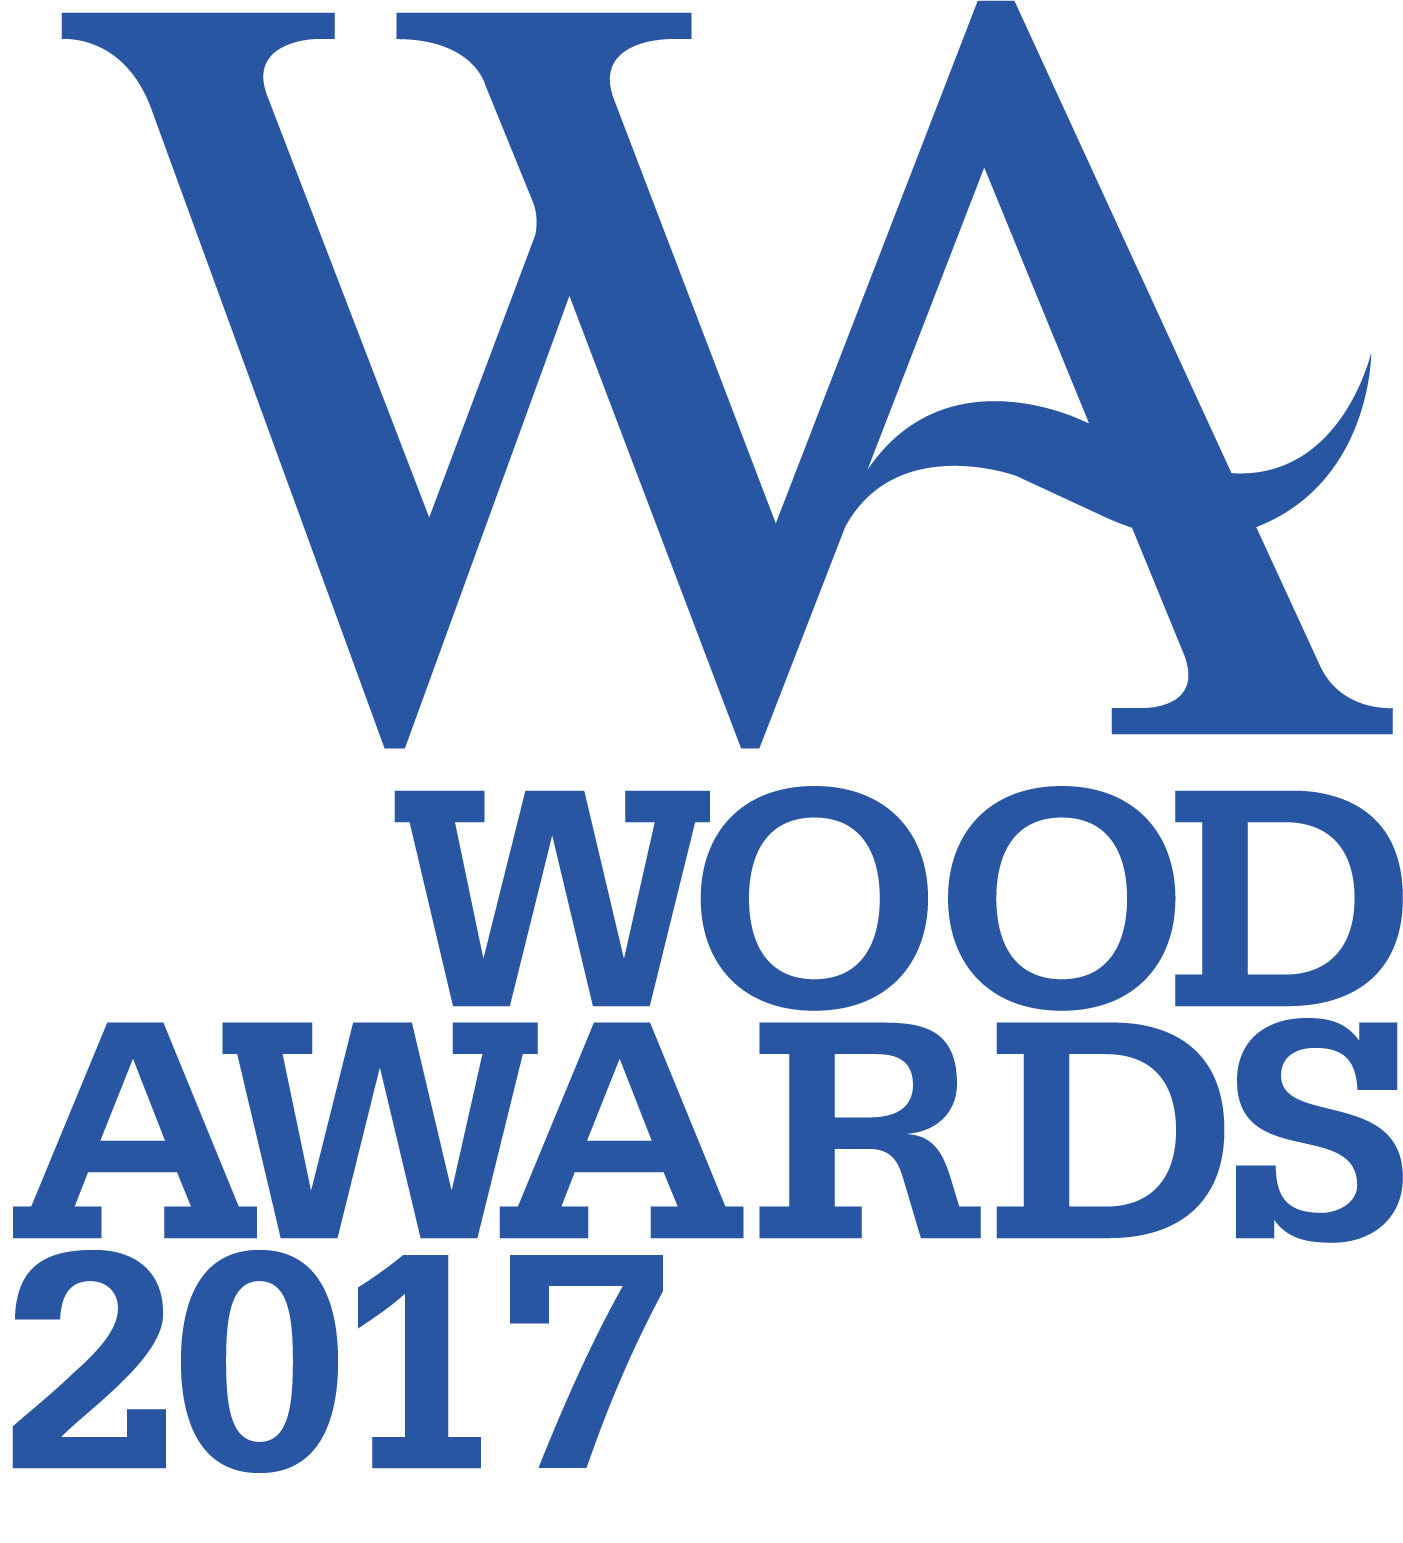 WA2017 logo